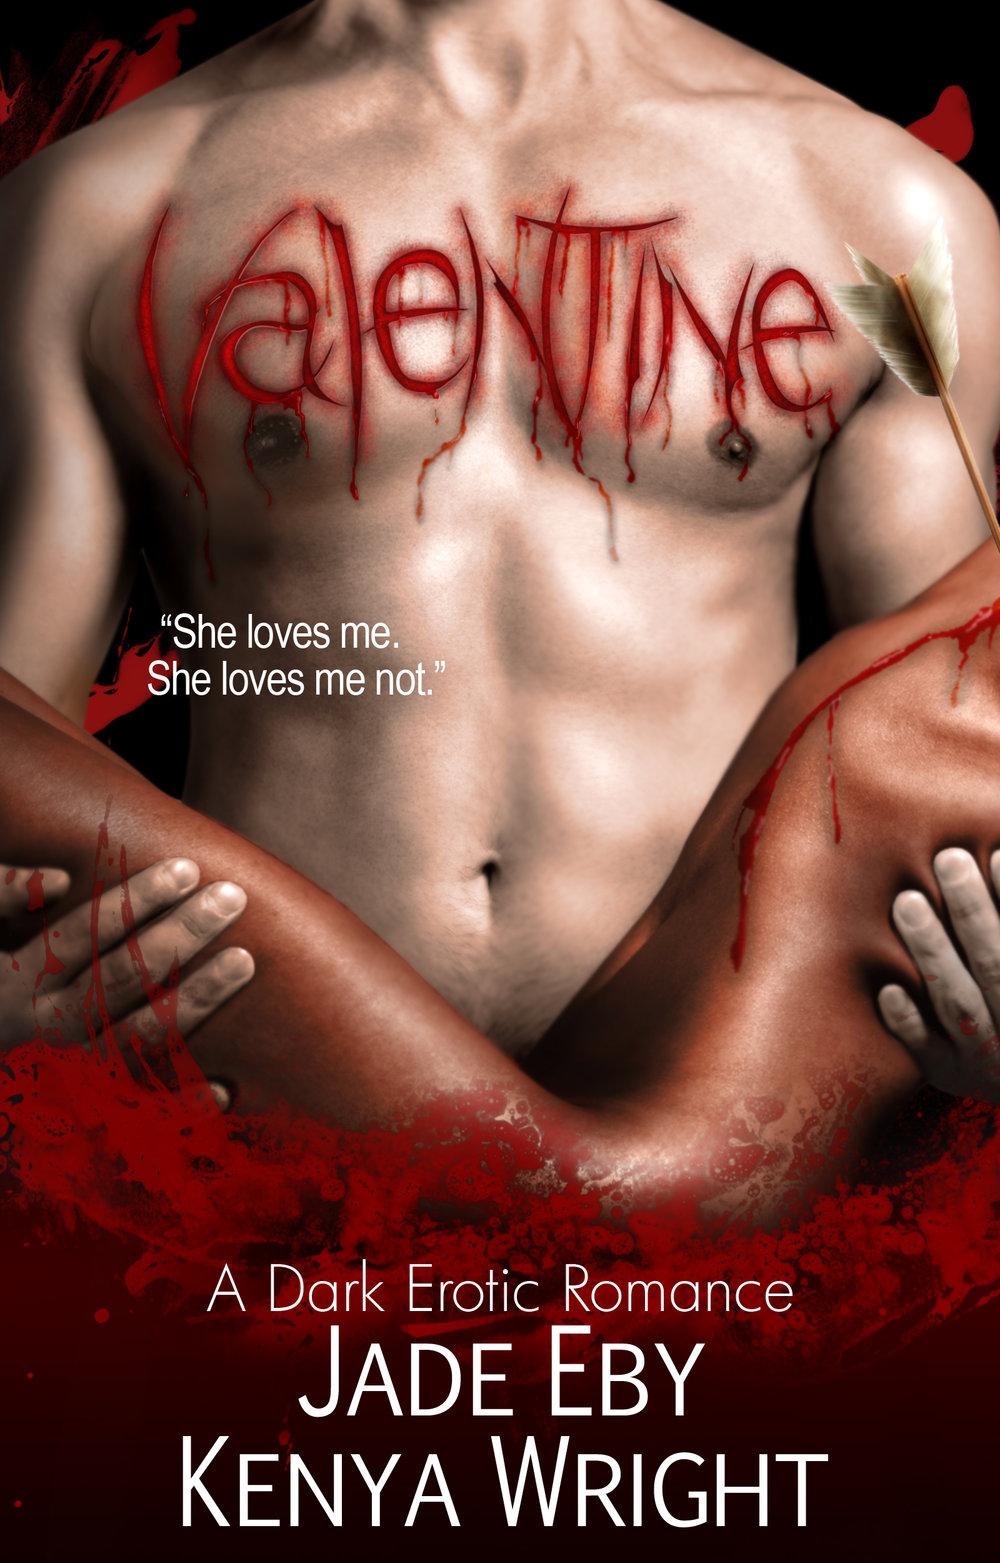 valentine_cover5.jpg